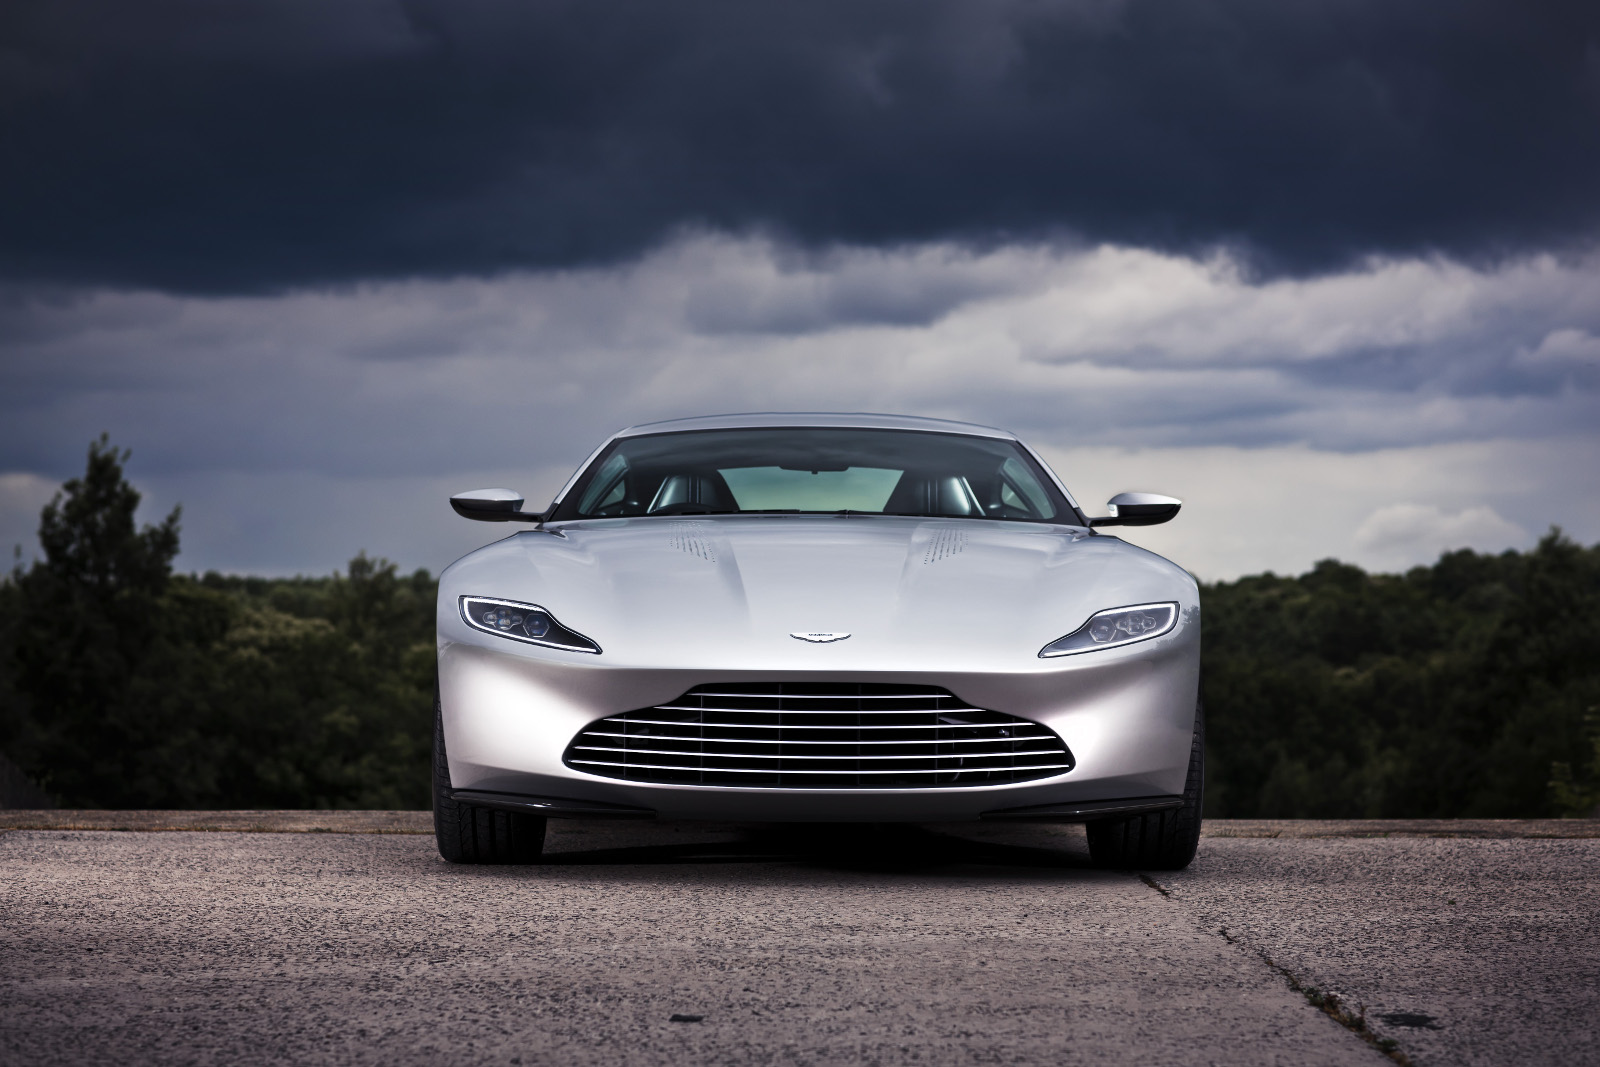 Aston Martin DB10 - Vista frontal